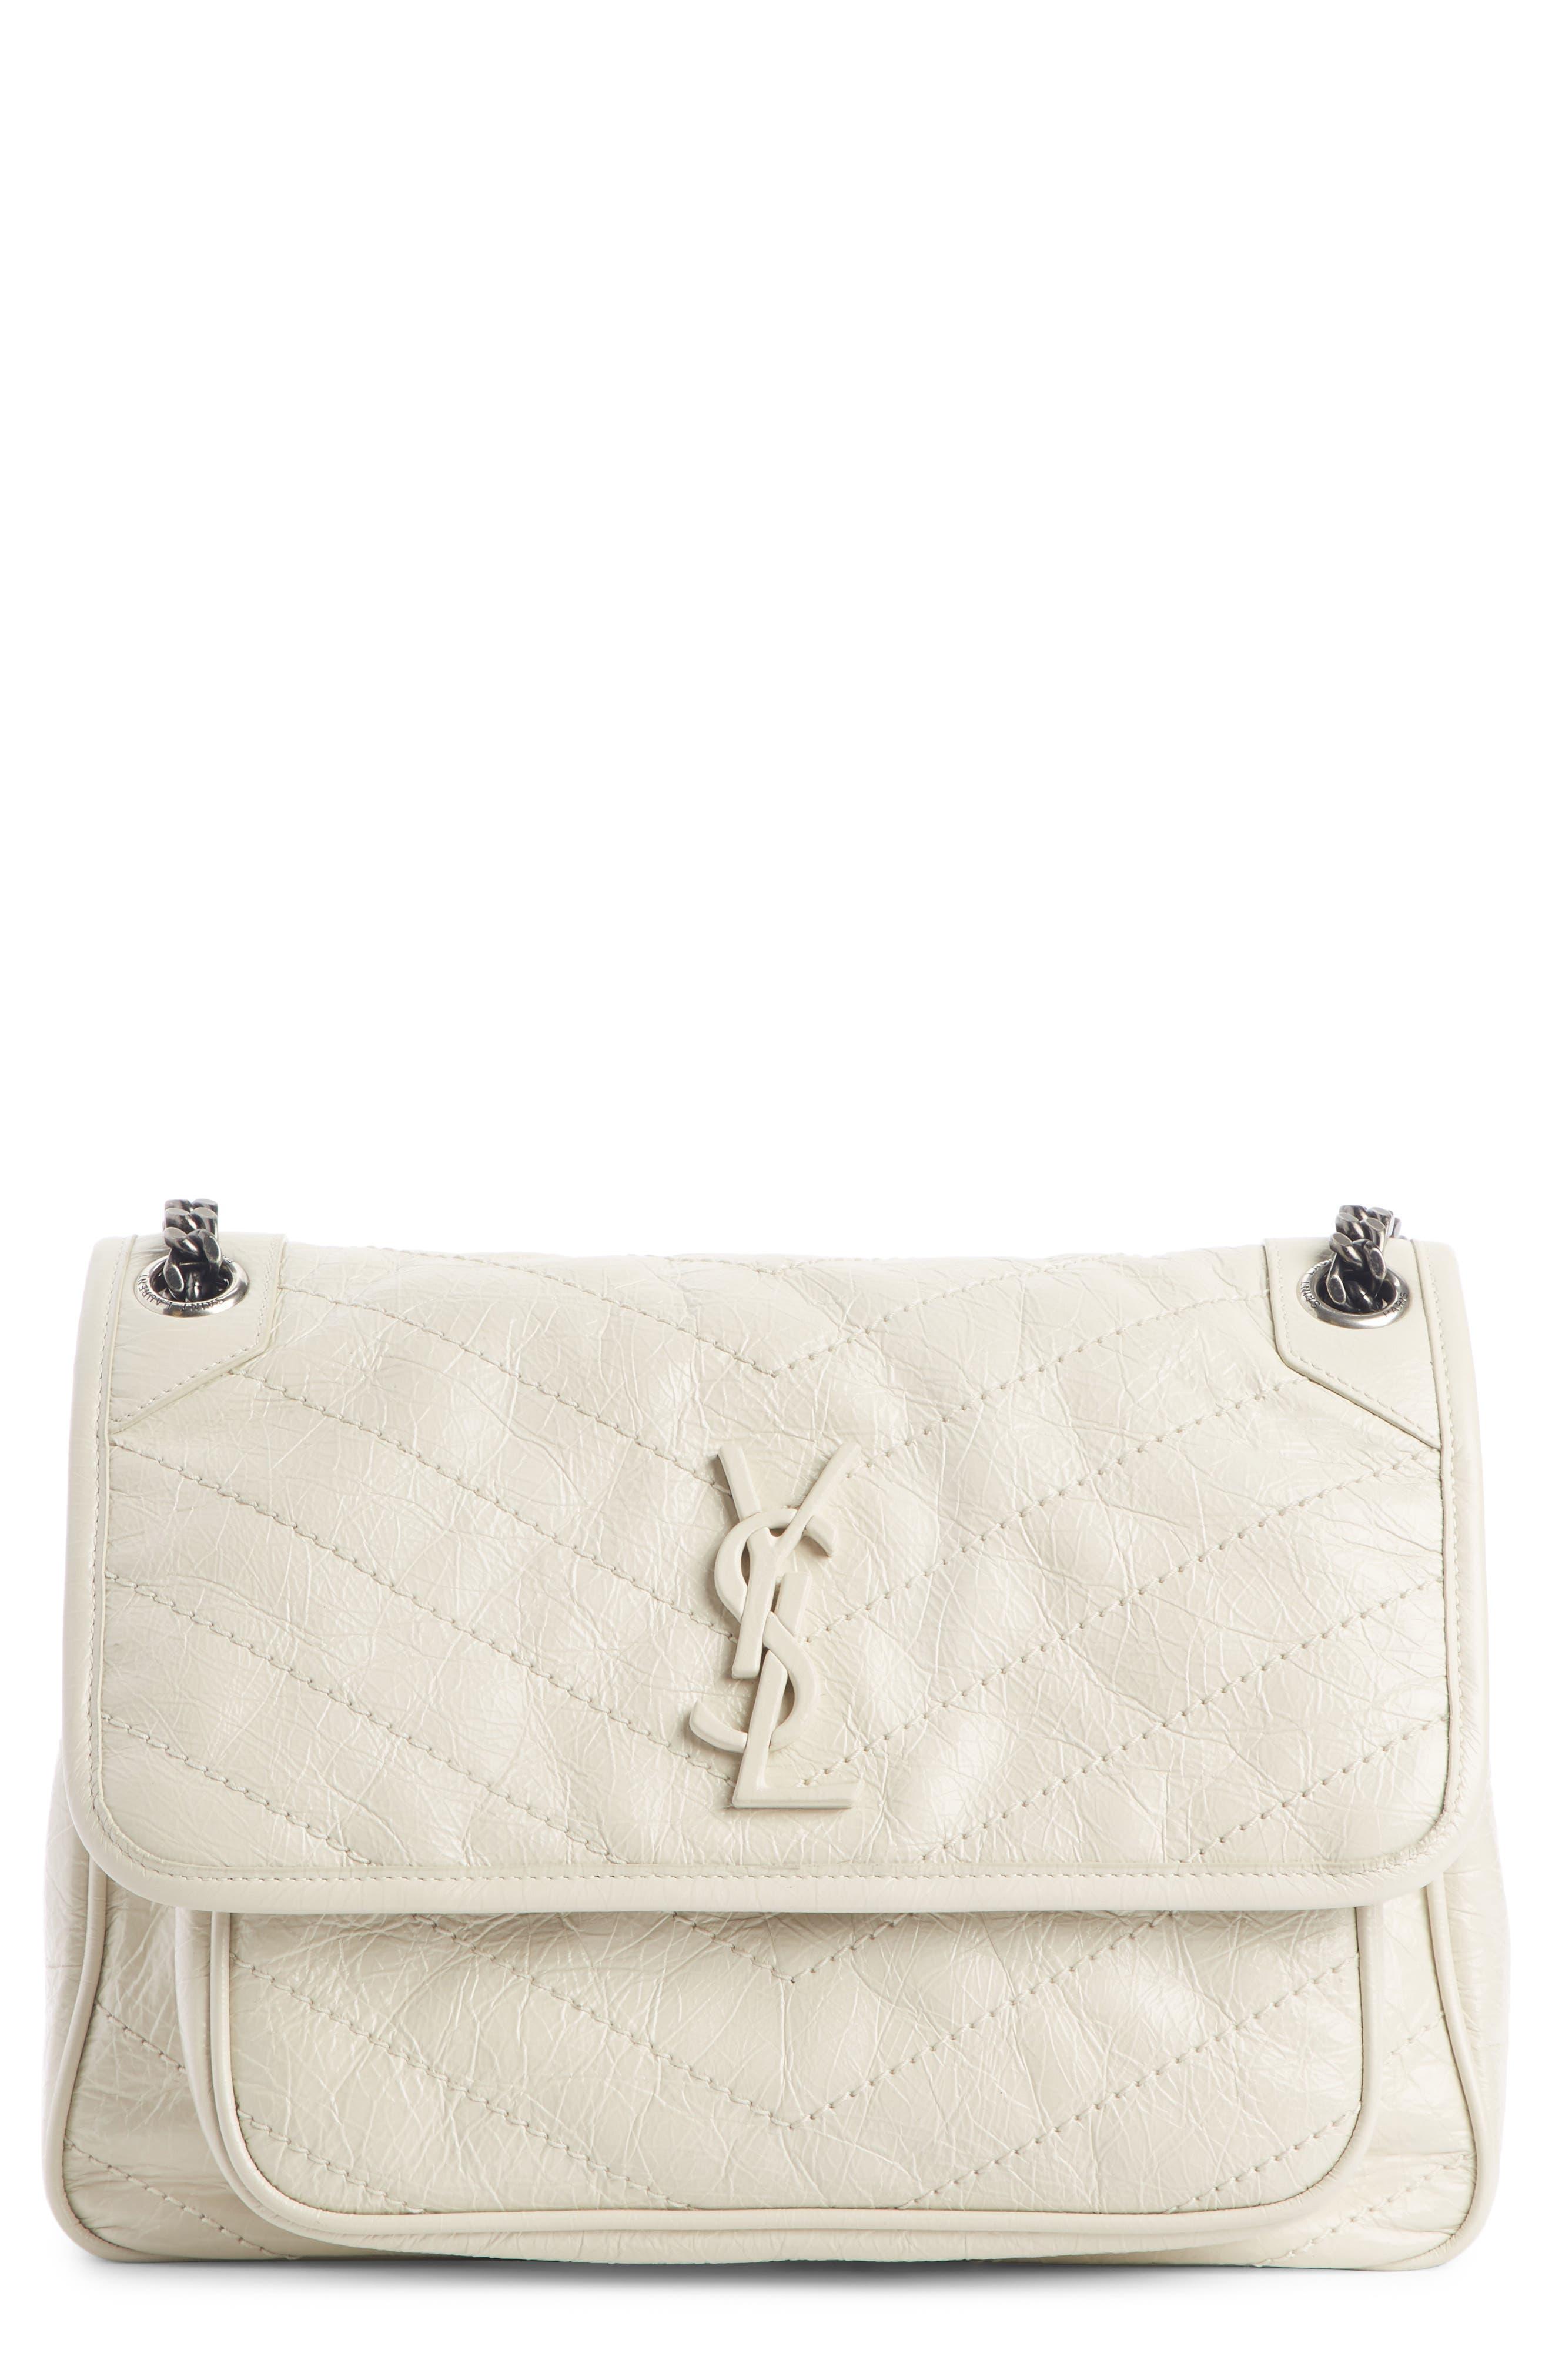 SAINT LAURENT Medium Niki Leather Shoulder Bag, Main, color, CREMA SOFT